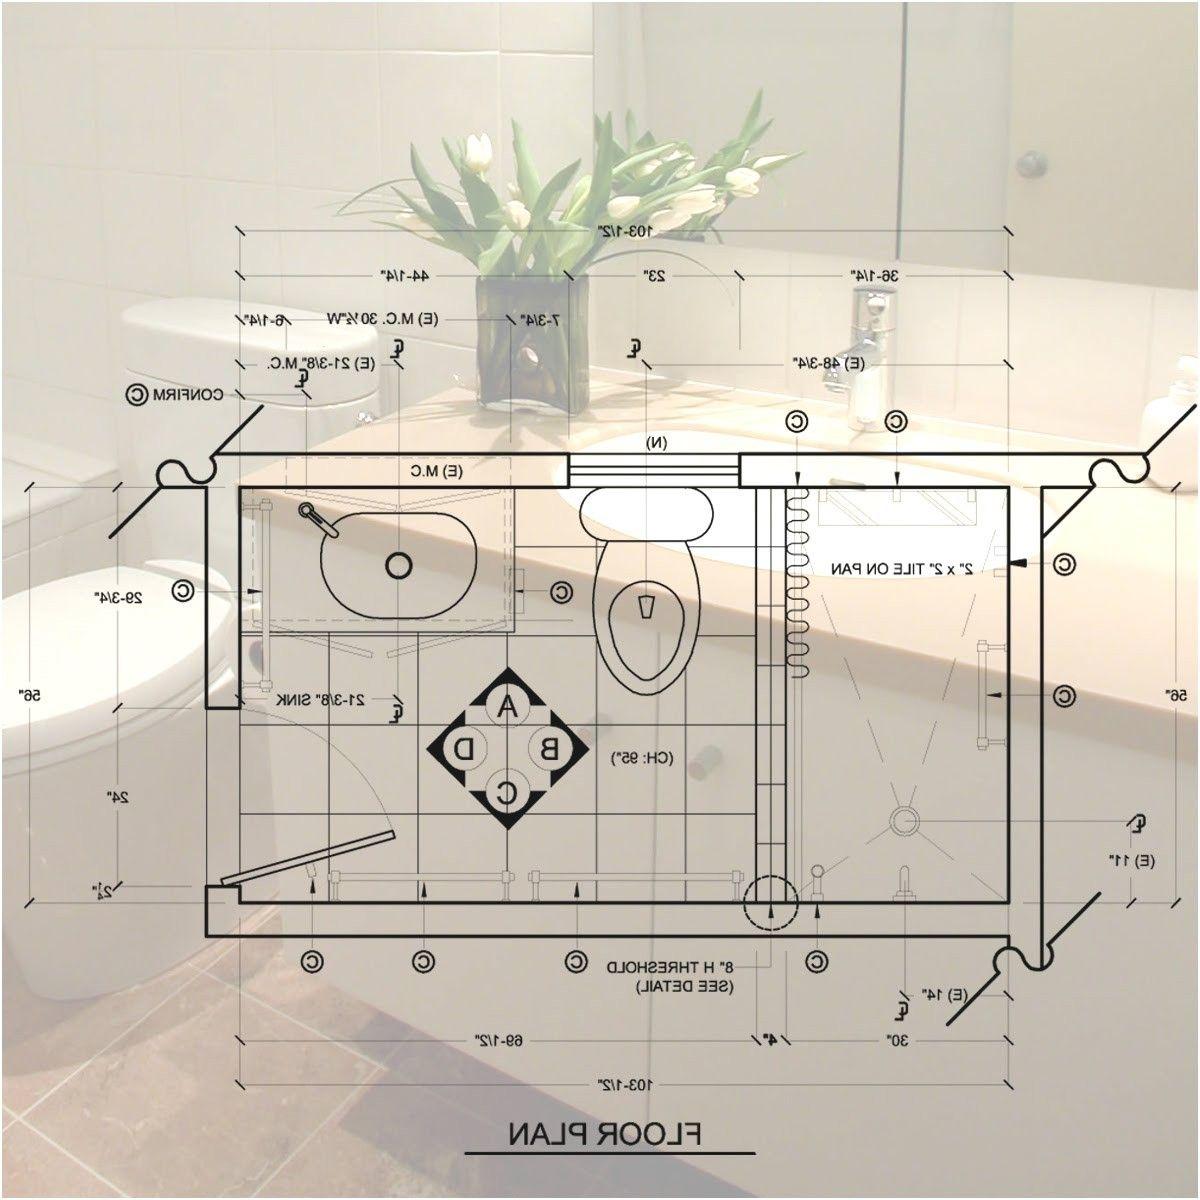 5 x 5 bathroom layout ideas ideas pinterest bathroom layout from 5